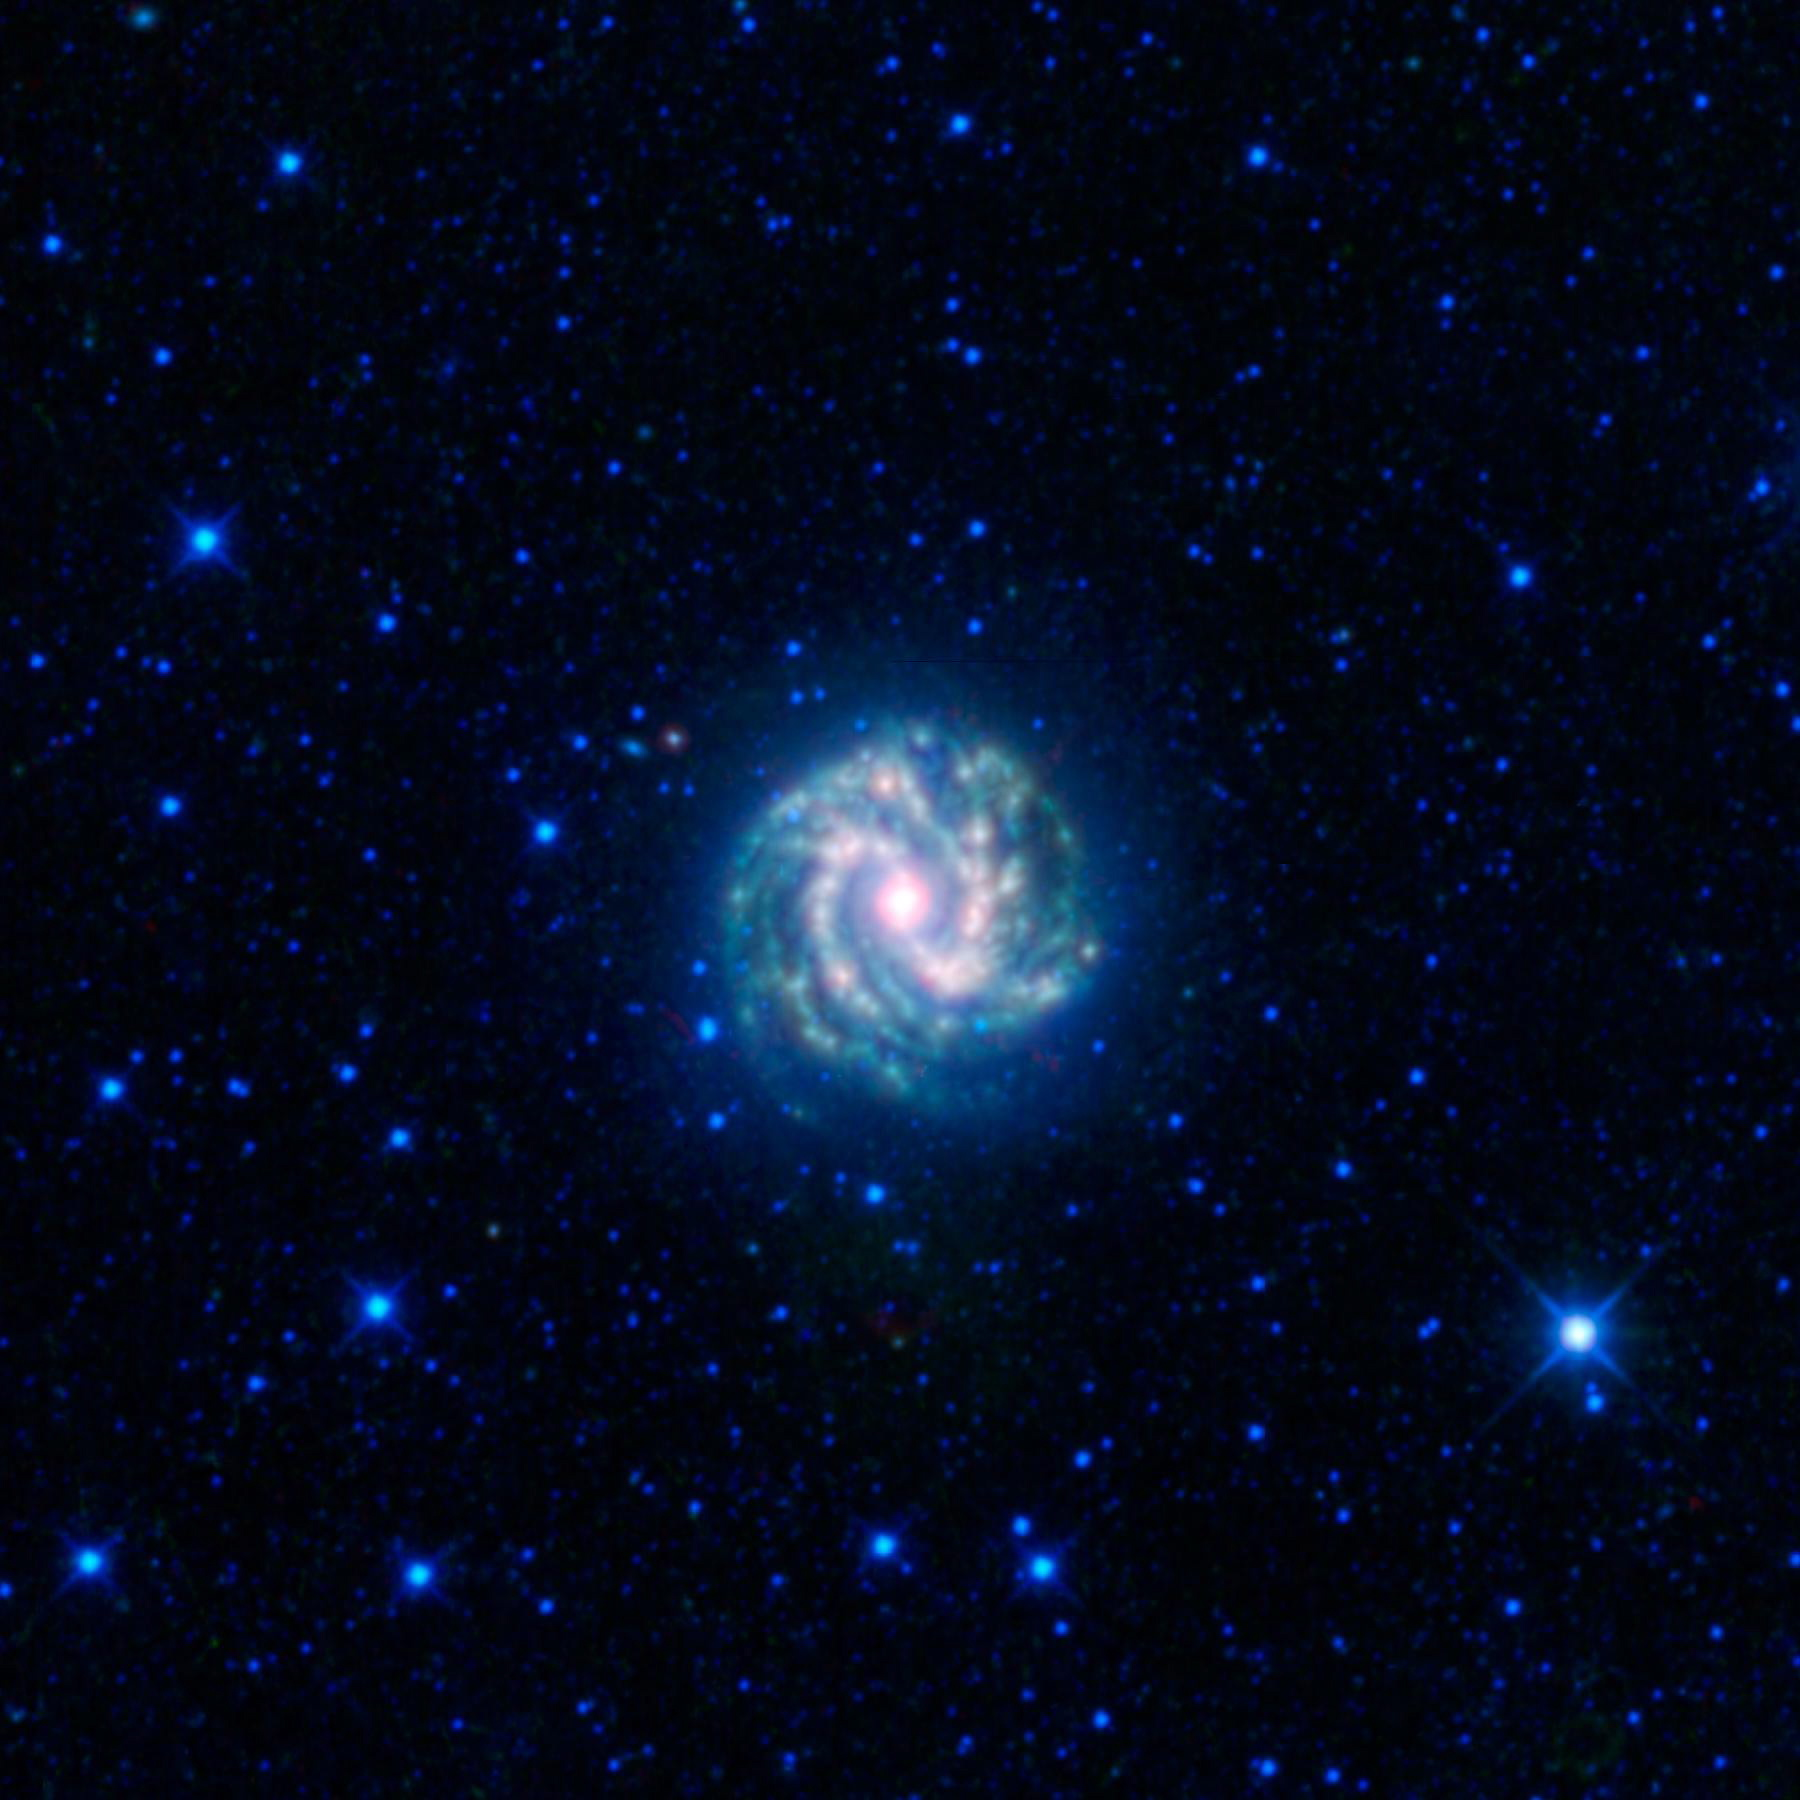 Откриха правоъгълна галактика